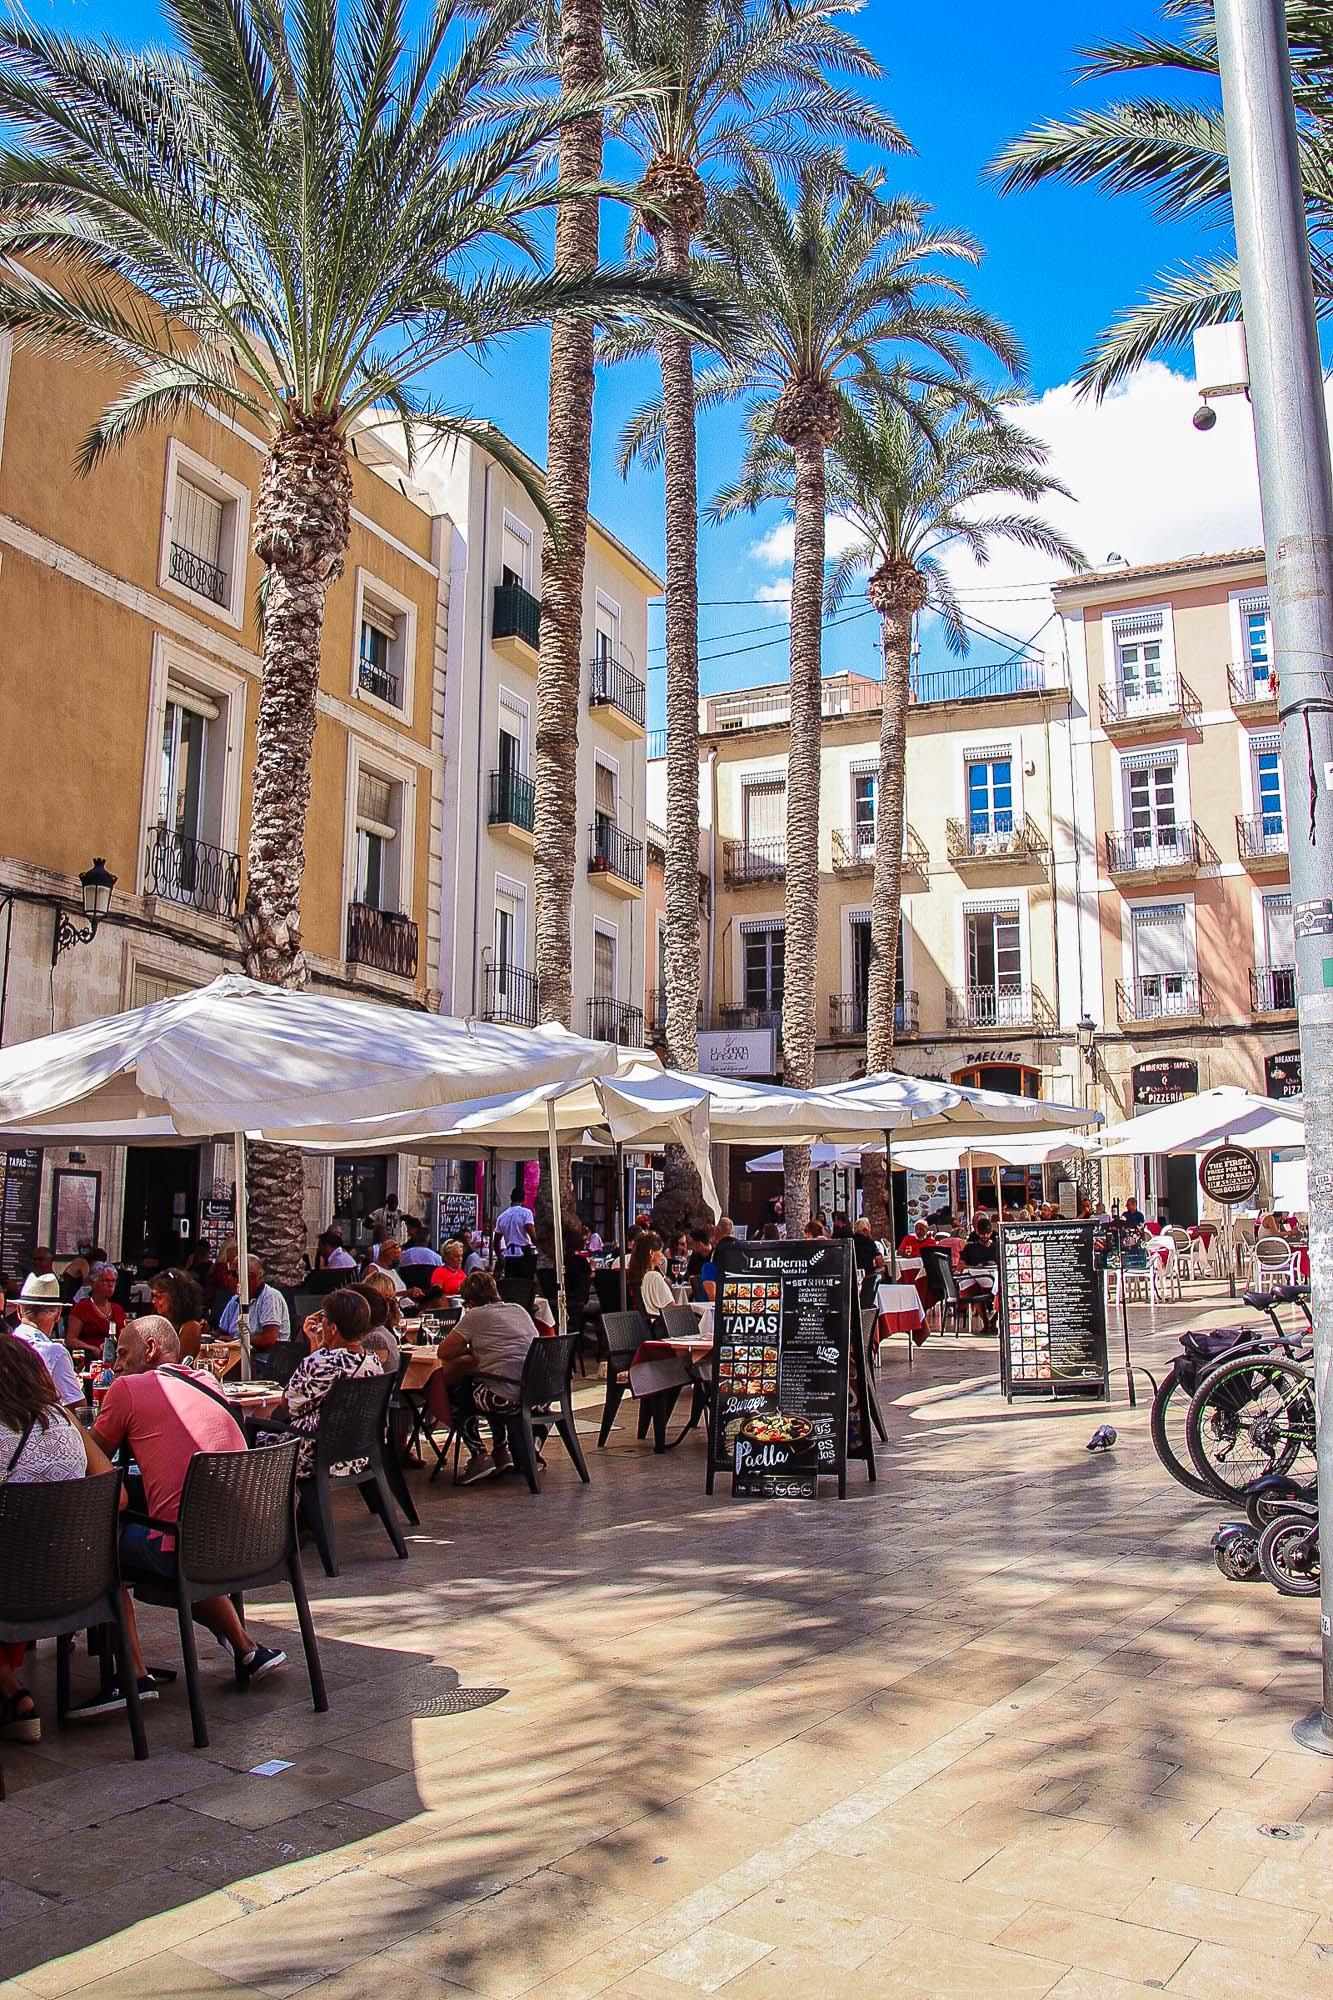 Alicante vanha kaupunki